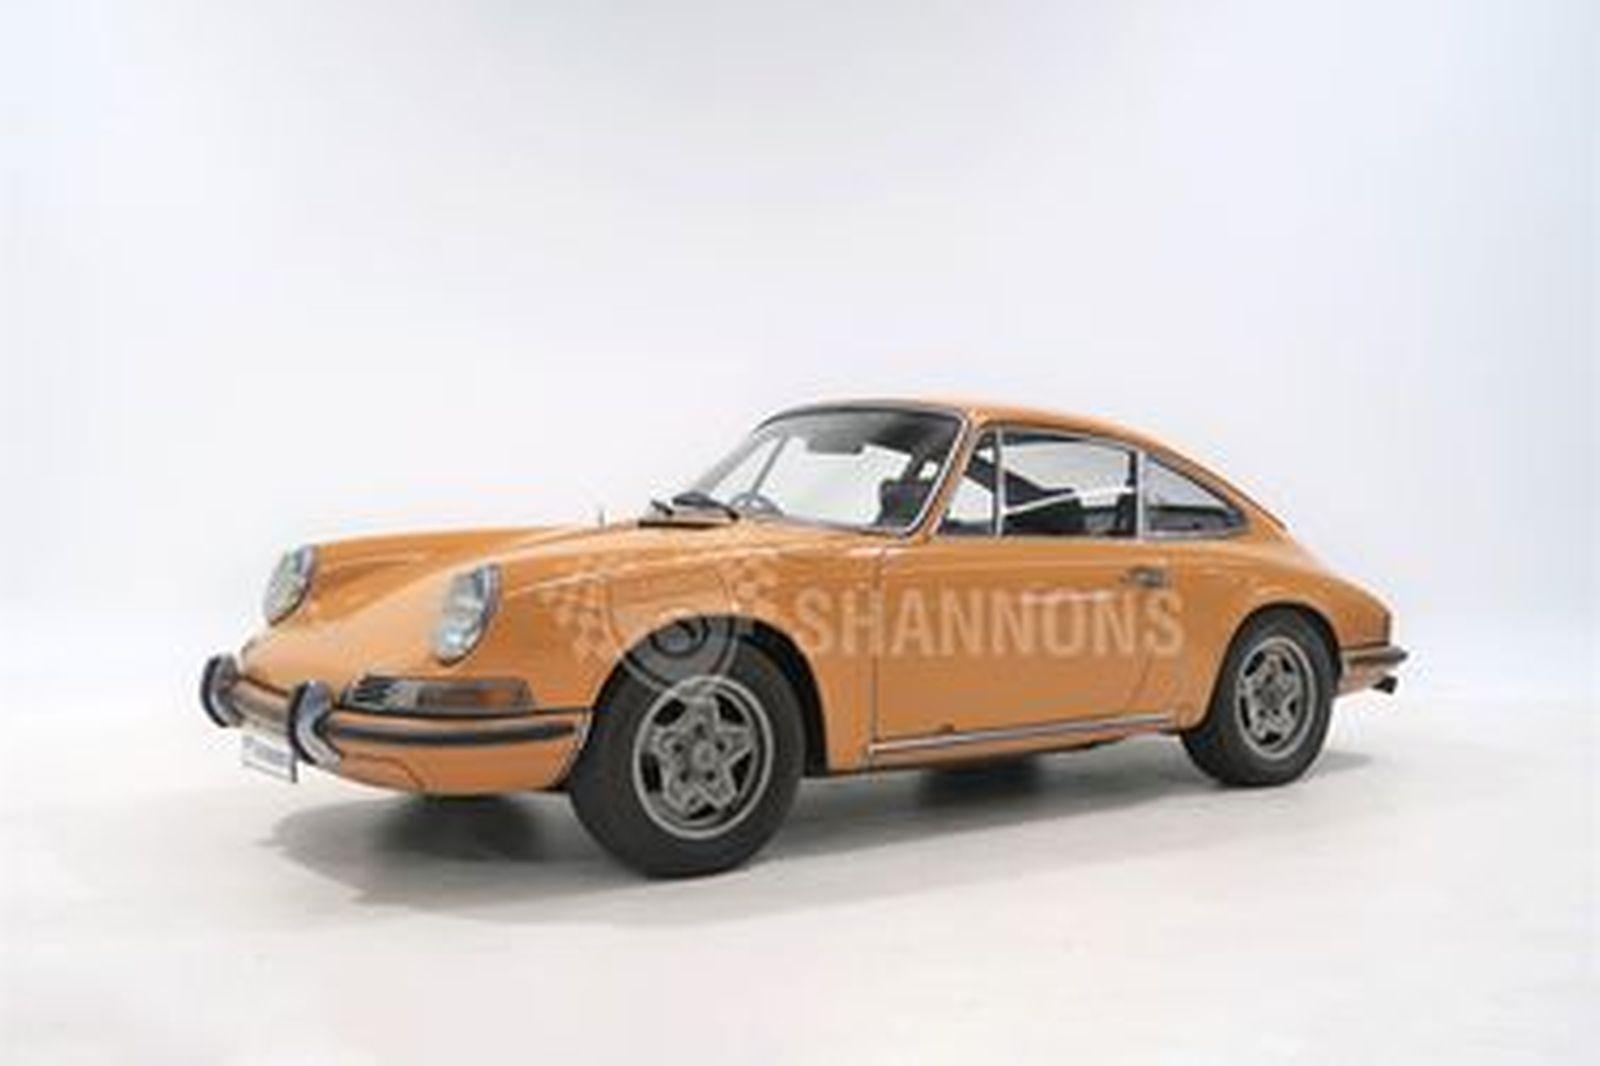 Porsche 911T 2.0 'Sportomatic' Coupe (Project)